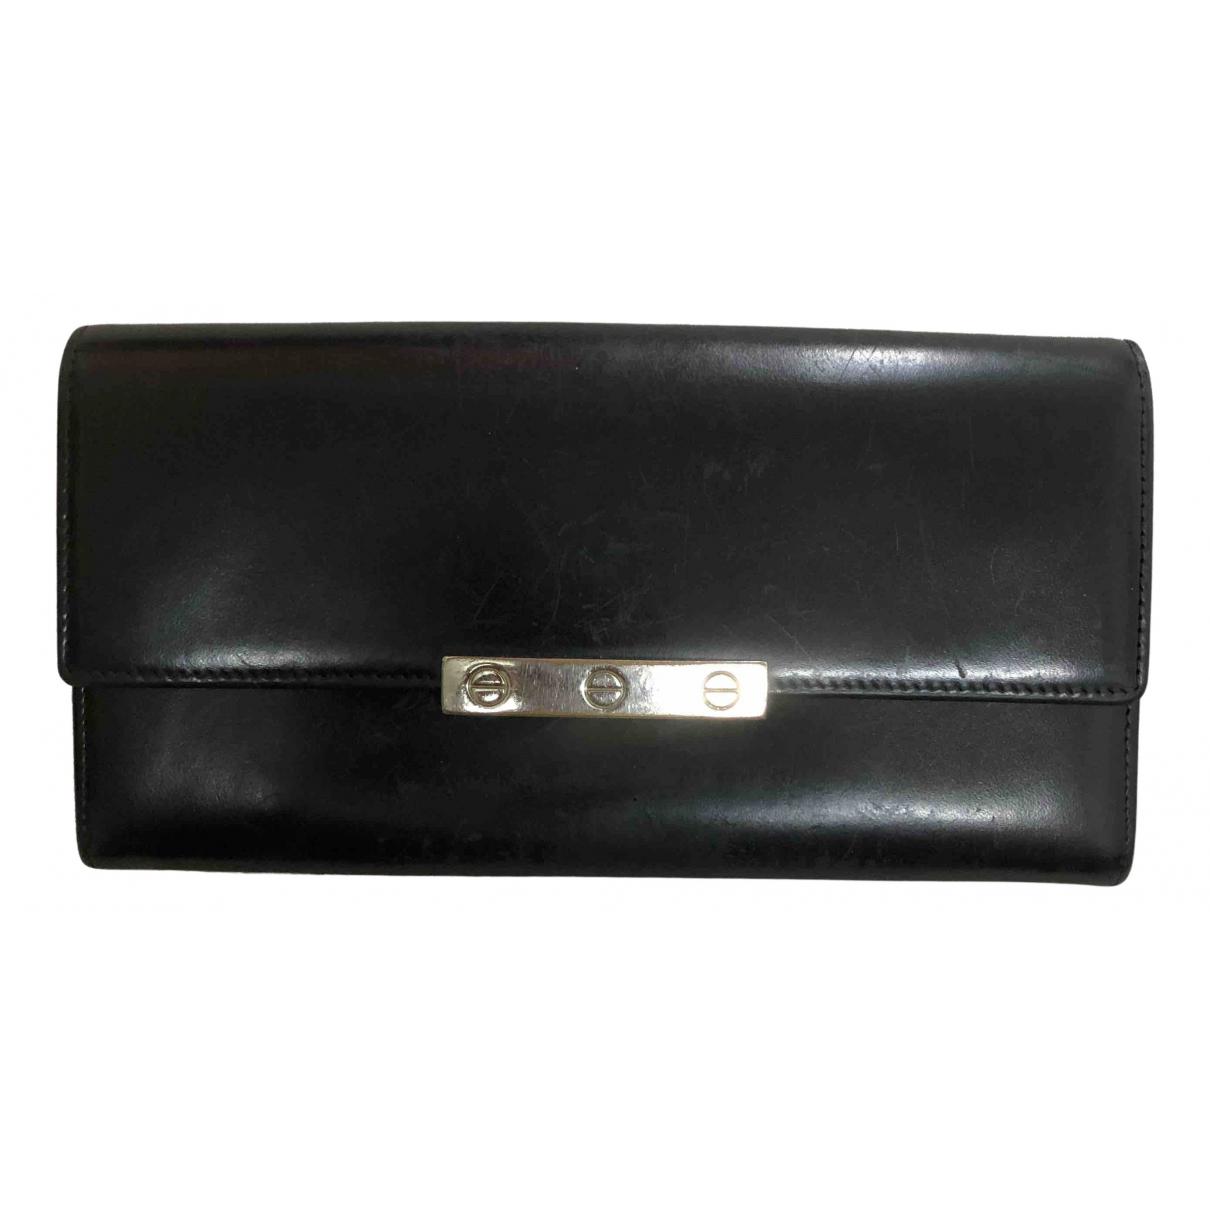 Cartier \N Kleinlederwaren in  Schwarz Leder